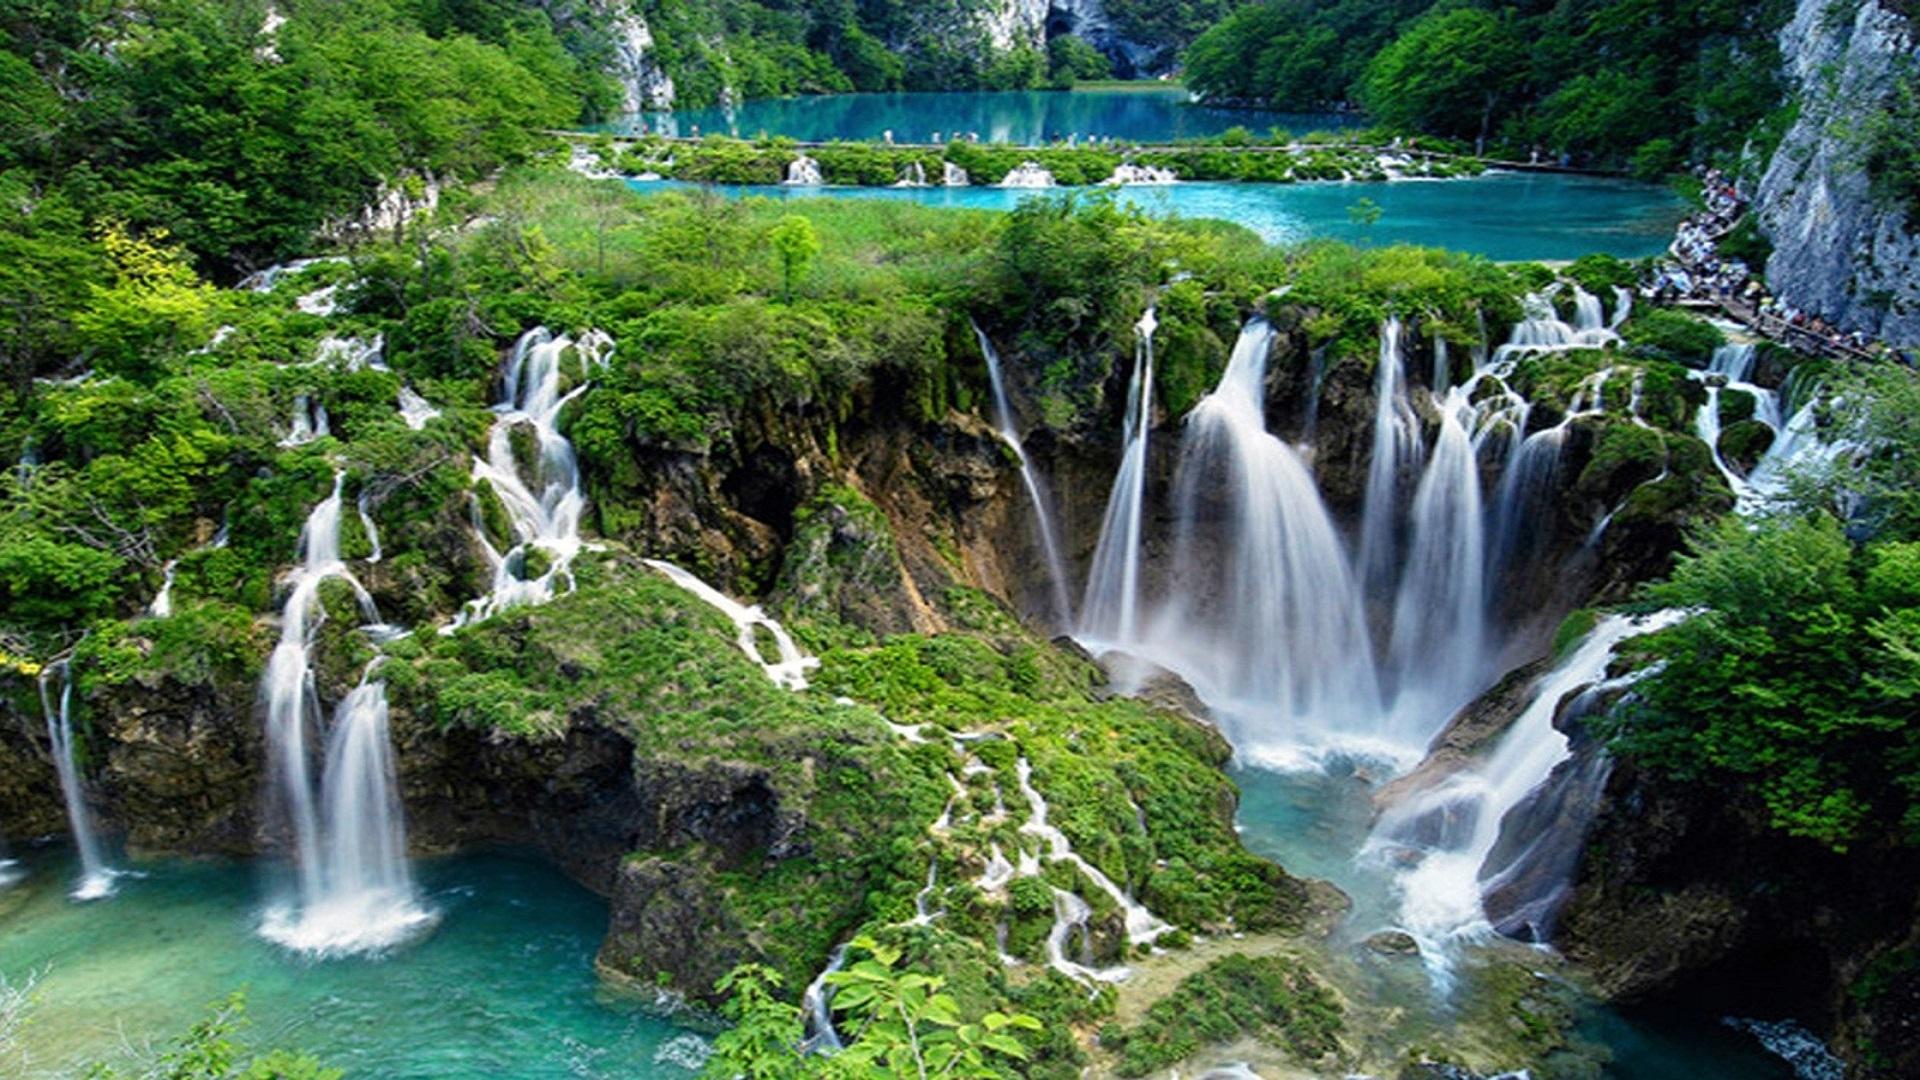 nature_waterfalls_wallpapers_for_desktop_free_hd - hd wallpaper